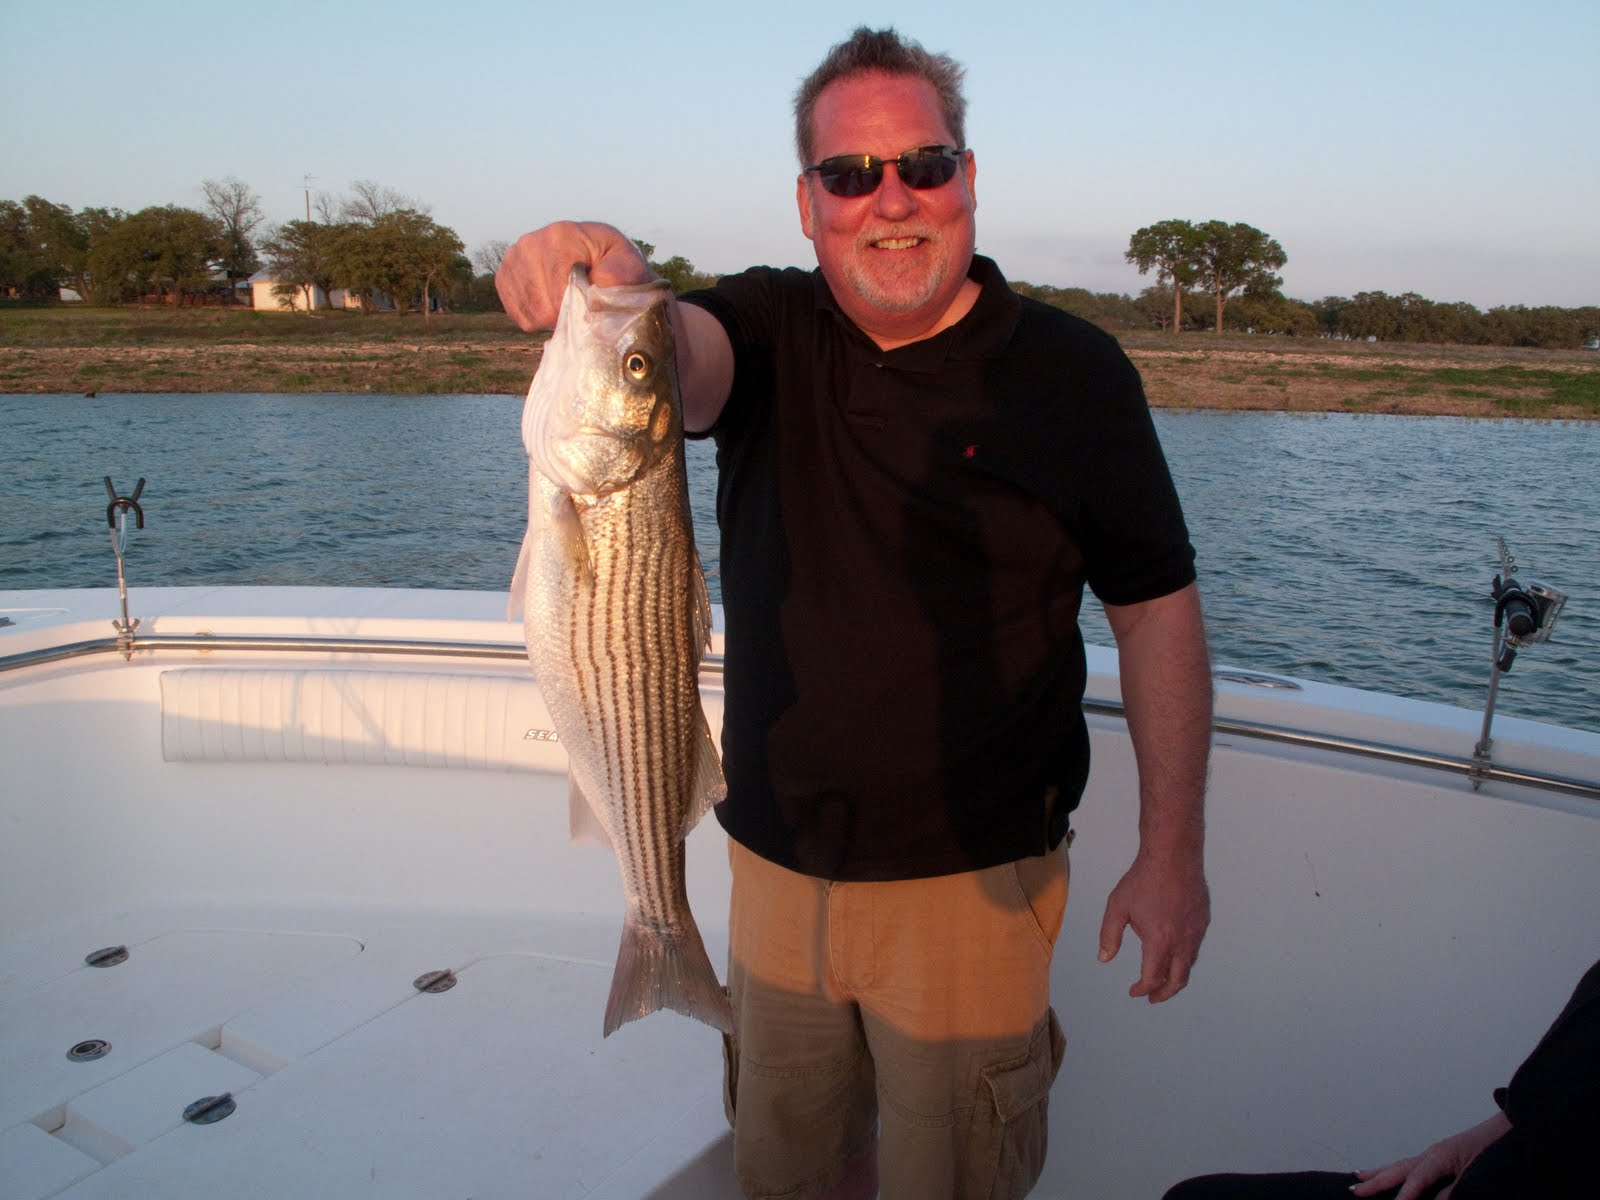 Follow your bliss striper fishing on lake buchanan for Lake buchanan fishing